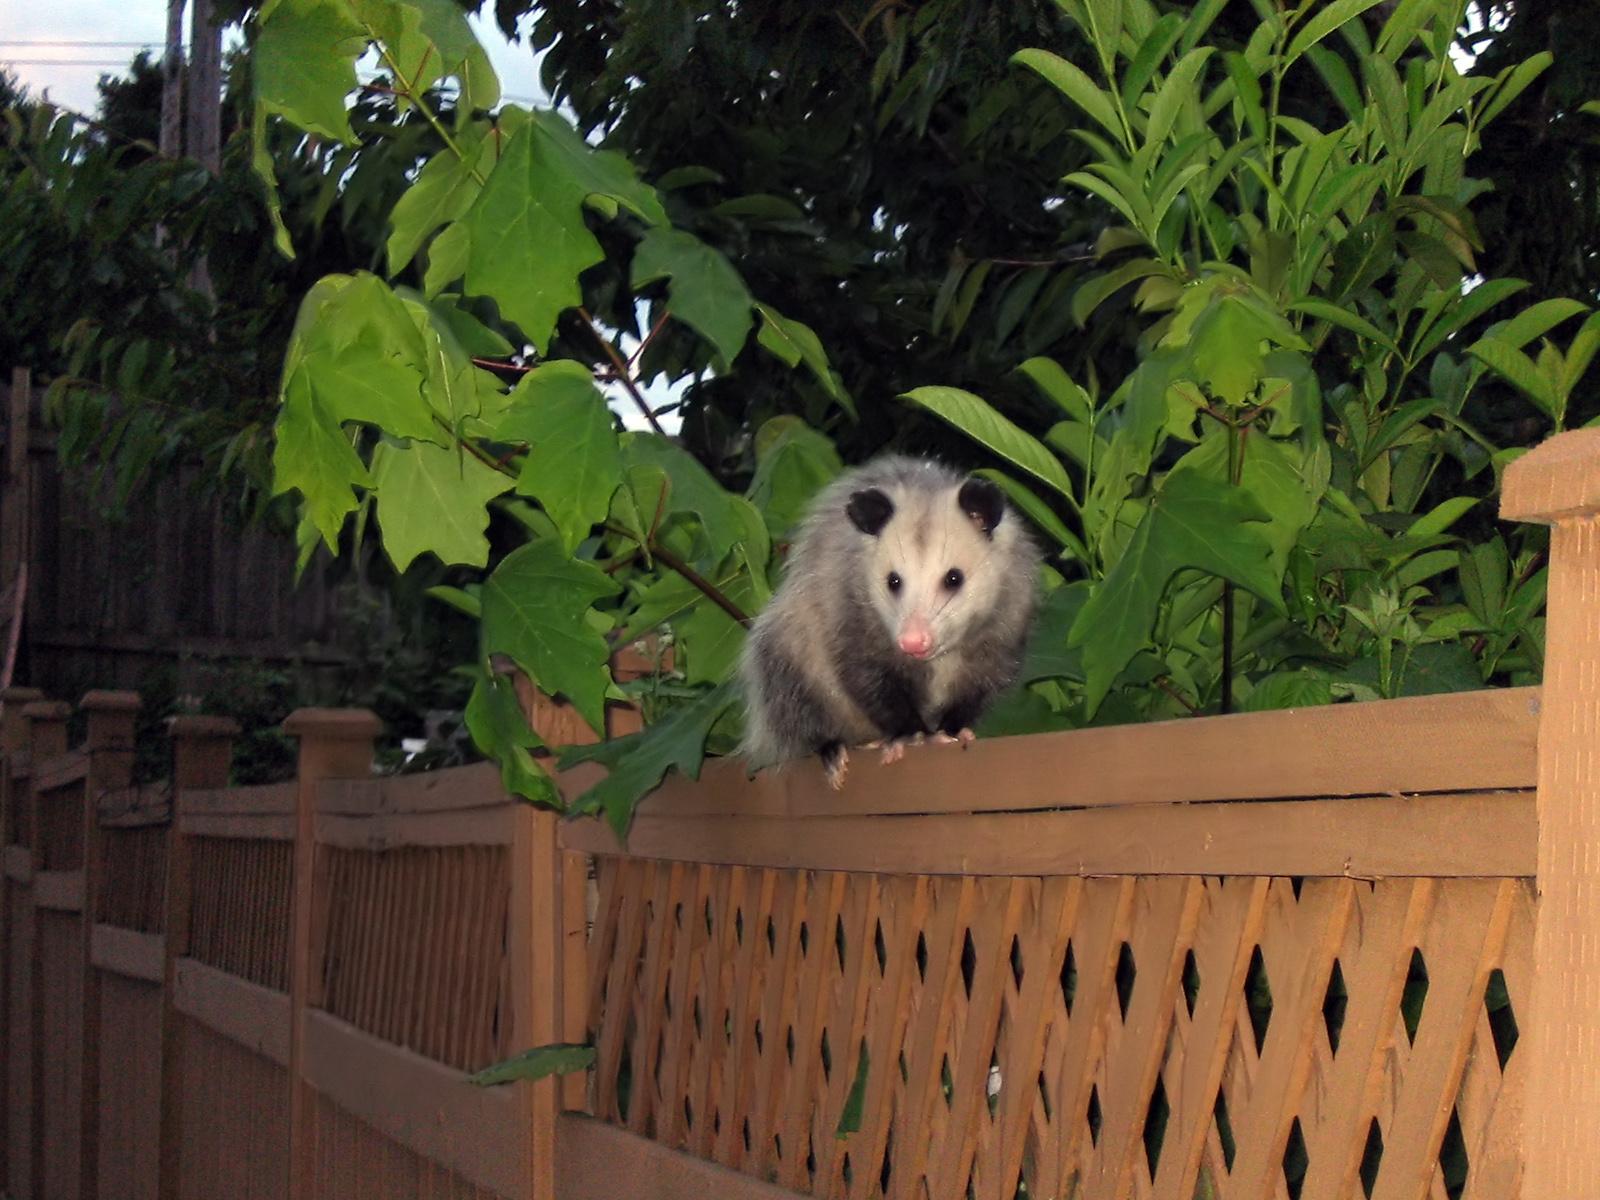 An opossum perches on an urban fence. (Photo |  Wikipedia )